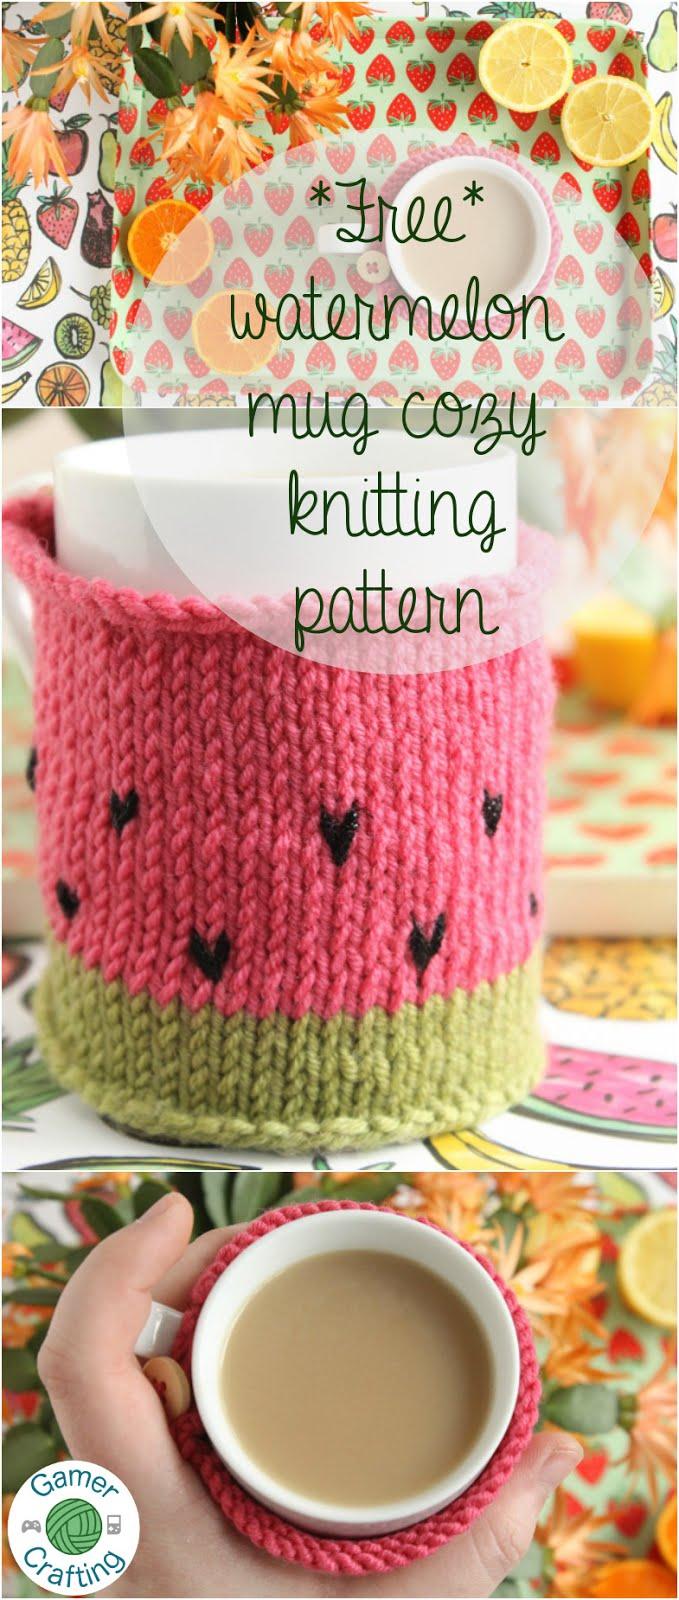 free knitting patterns Archives - GamerCrafting Yarns